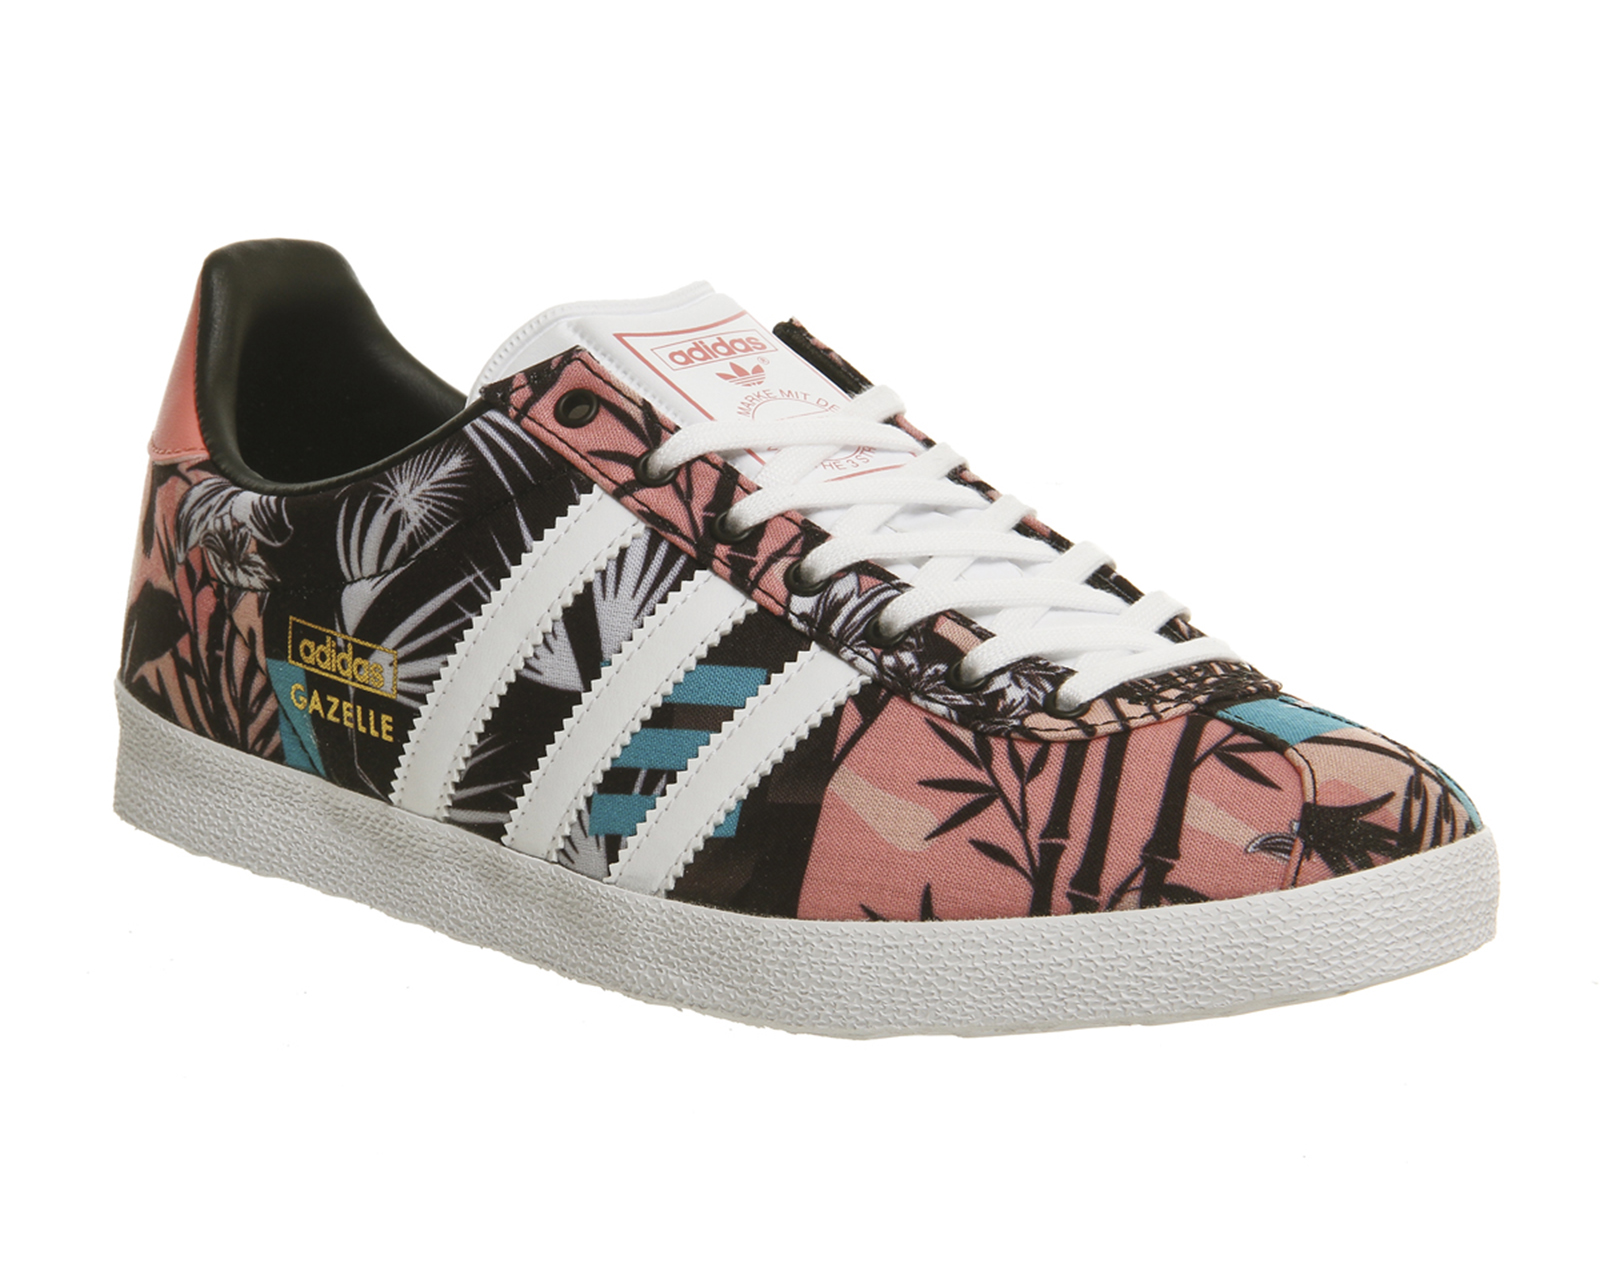 ladies adidas gazelle trainers sale